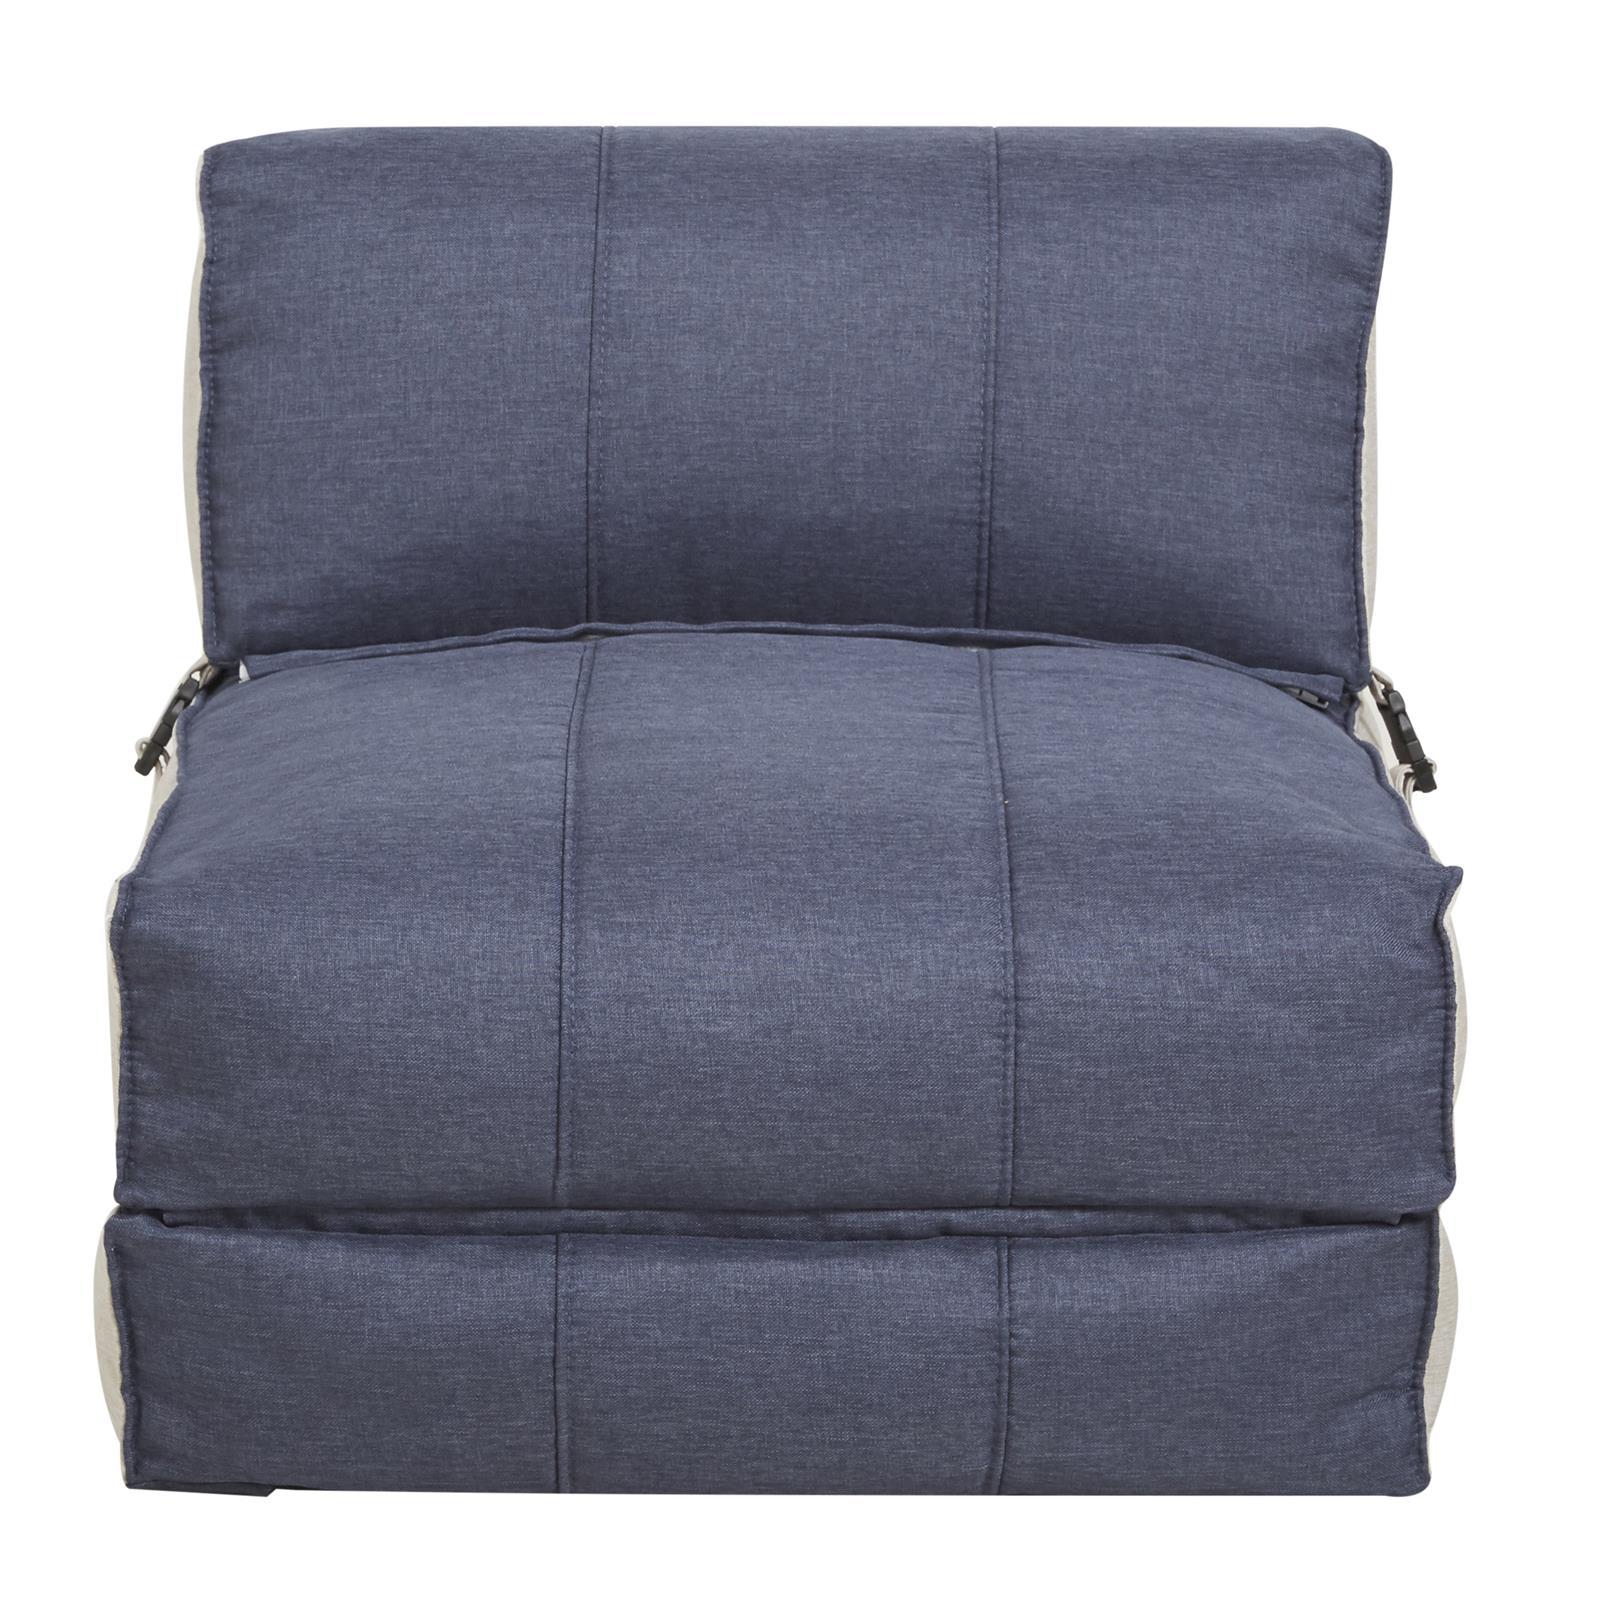 schlafsessel g stebett stoffbezug in blau gr n oder grau. Black Bedroom Furniture Sets. Home Design Ideas